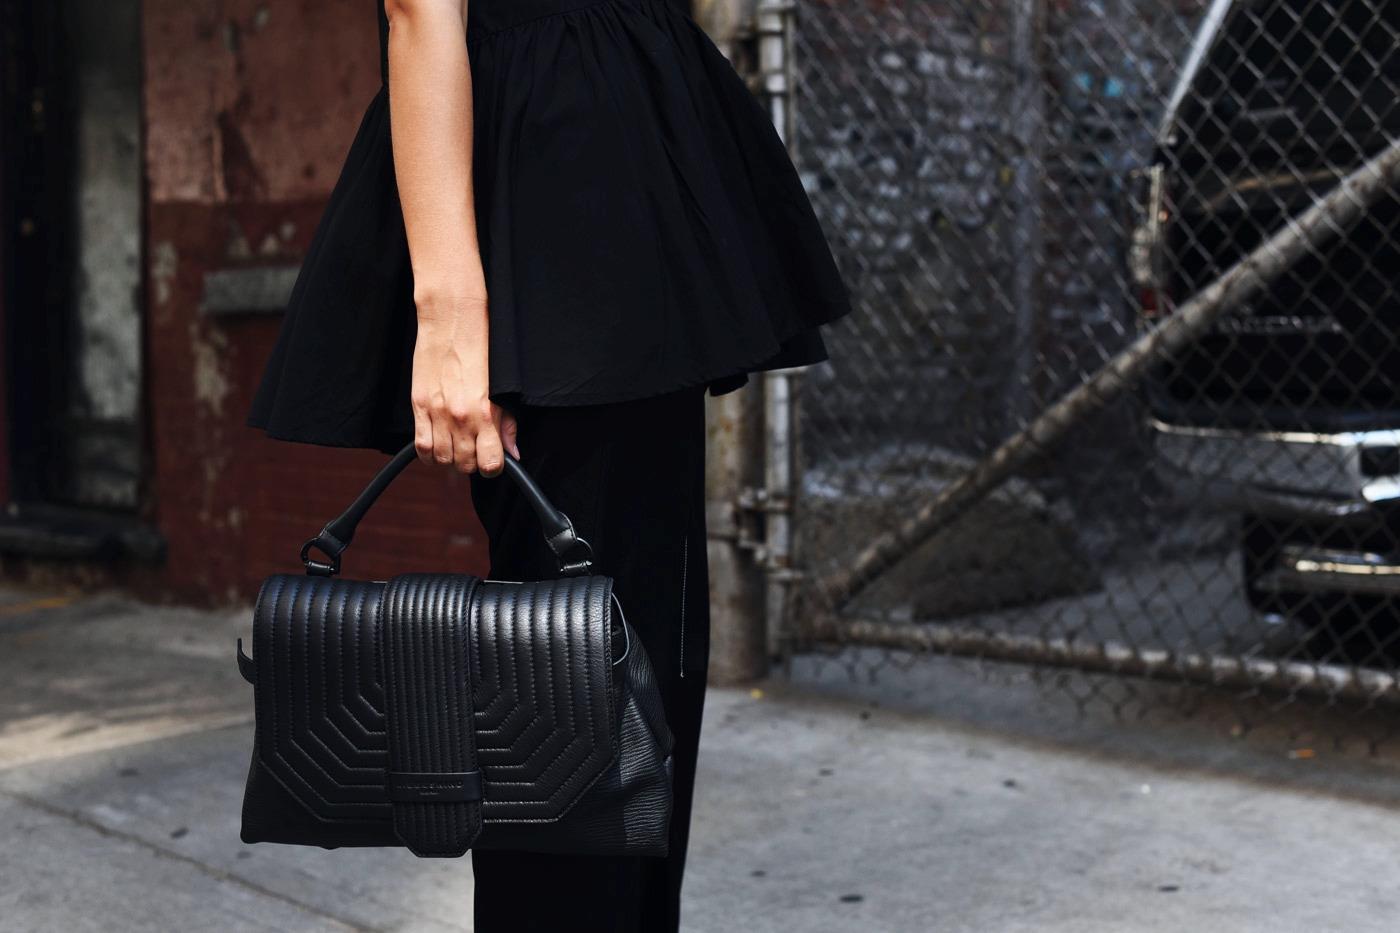 new-york-fashion-week-aw-2016-looks-in-schwarz-fashiioncarpet